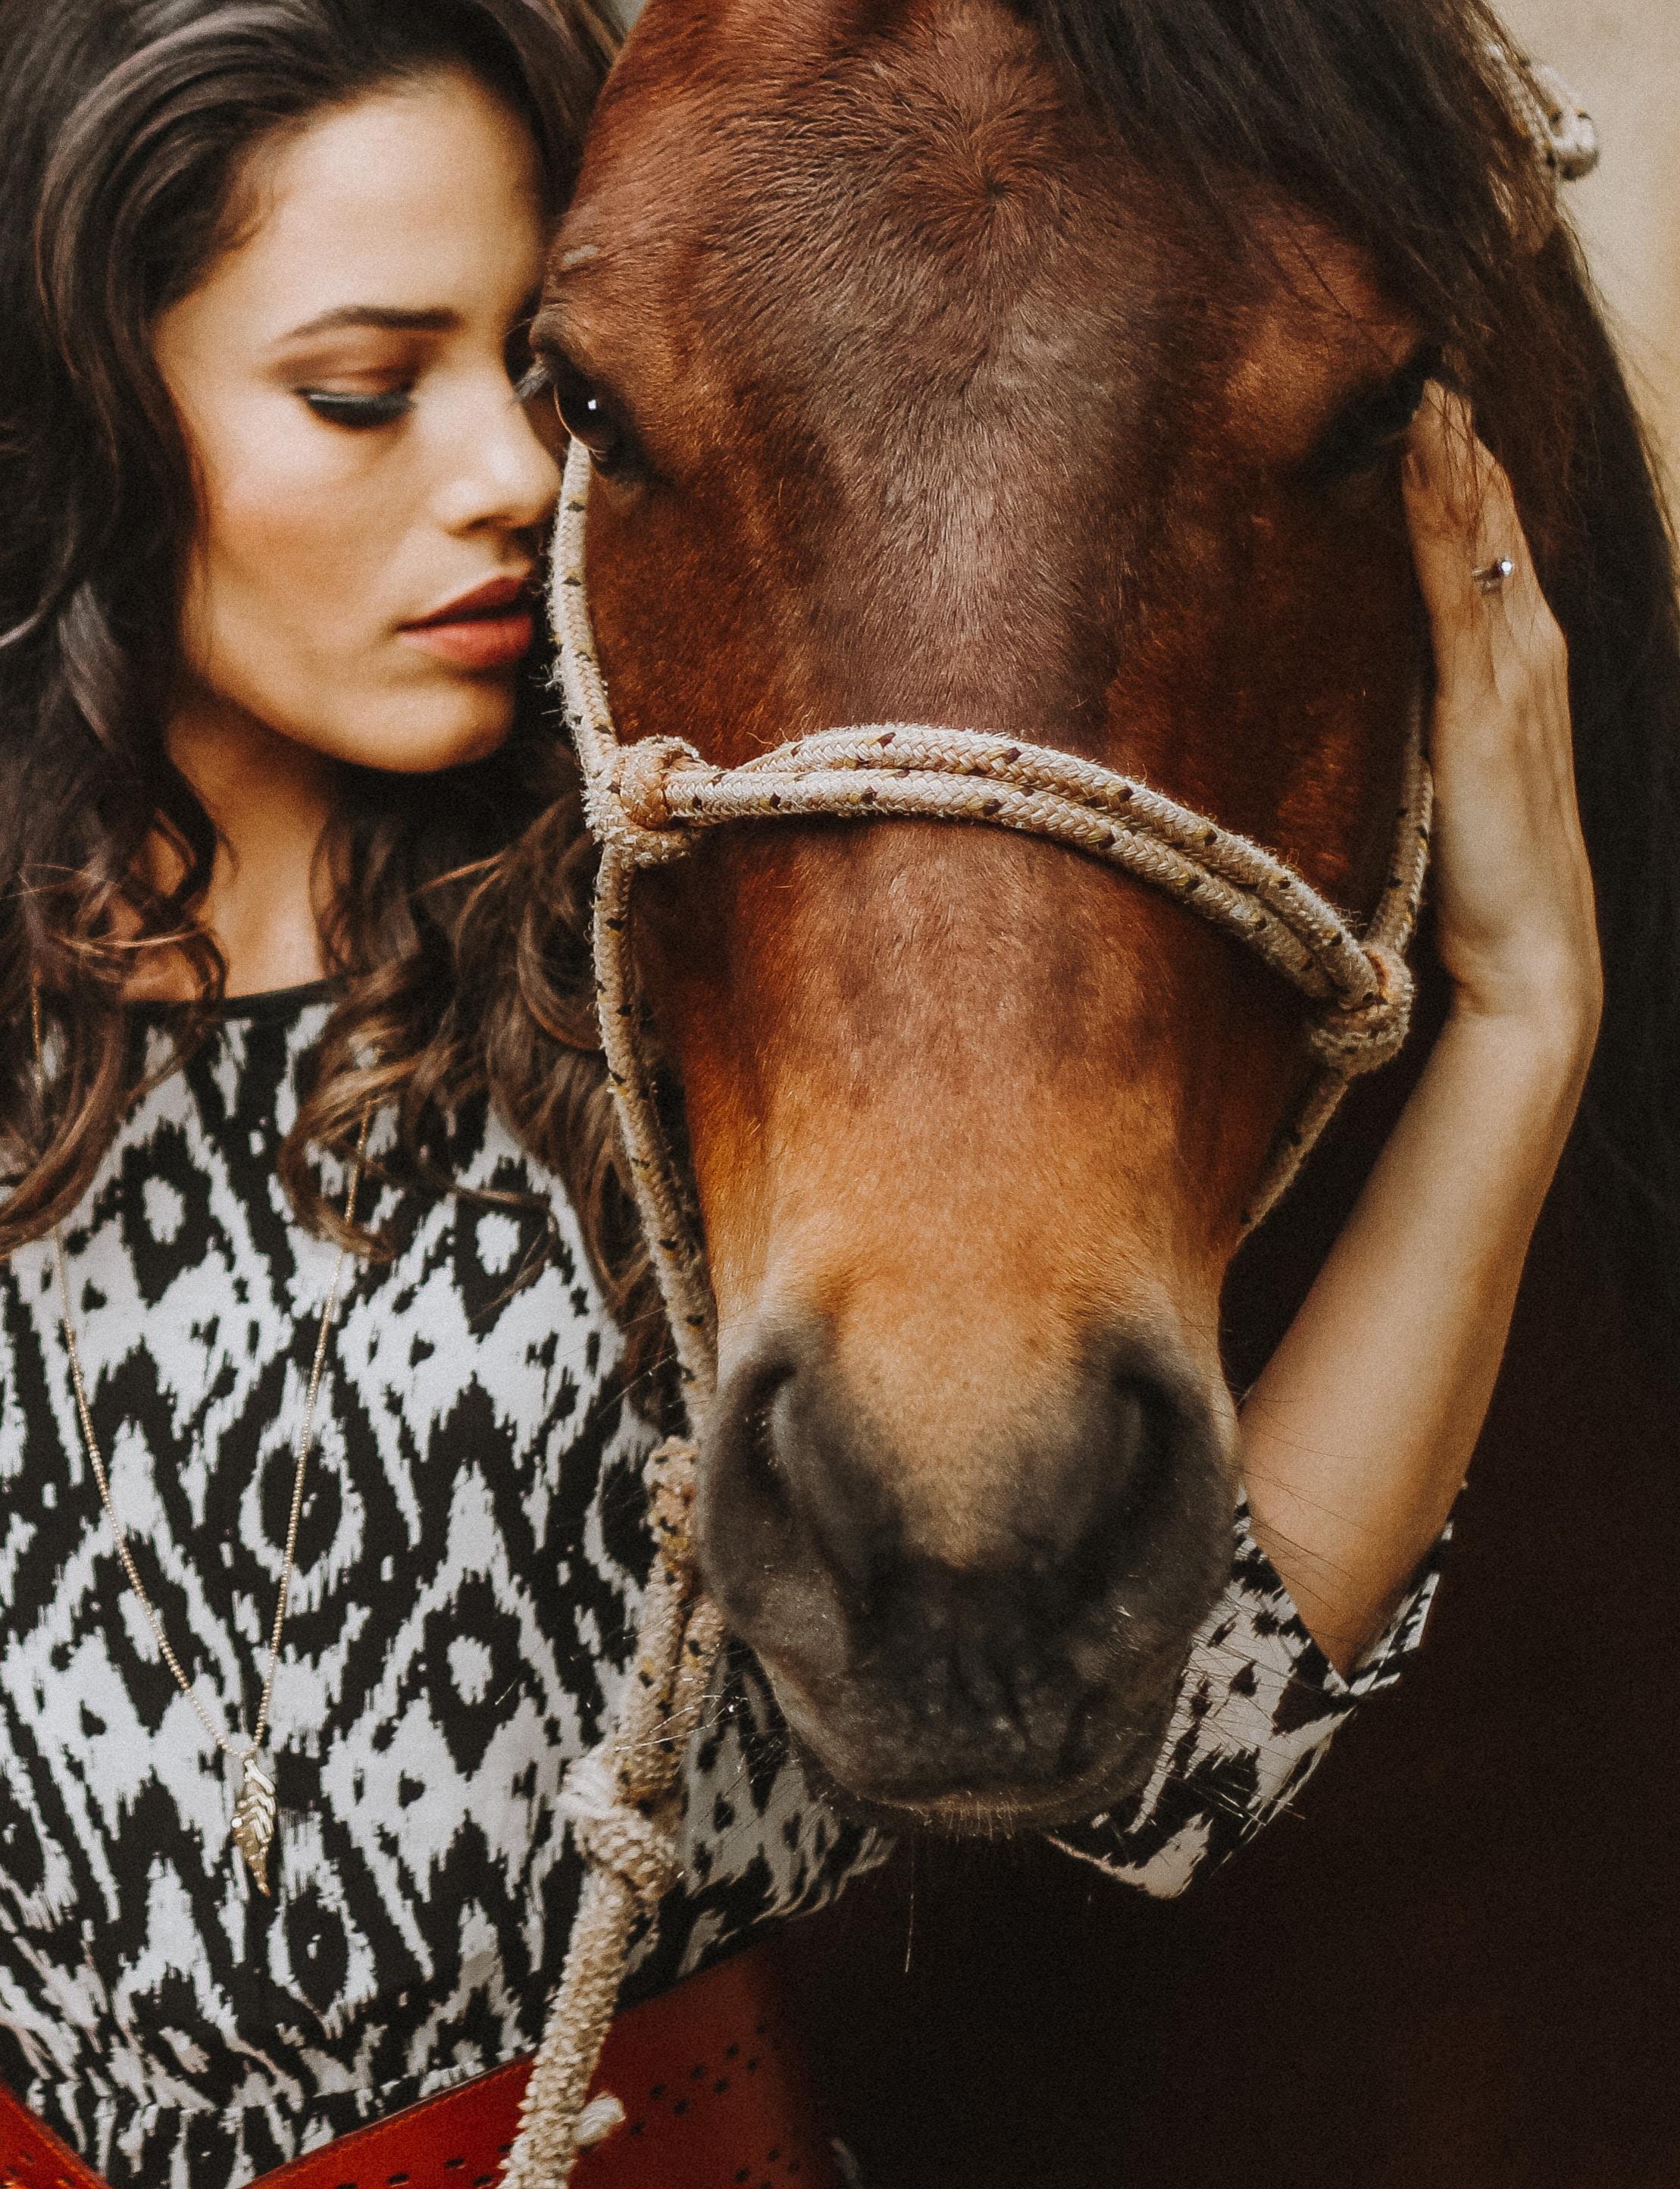 woman holding horse head